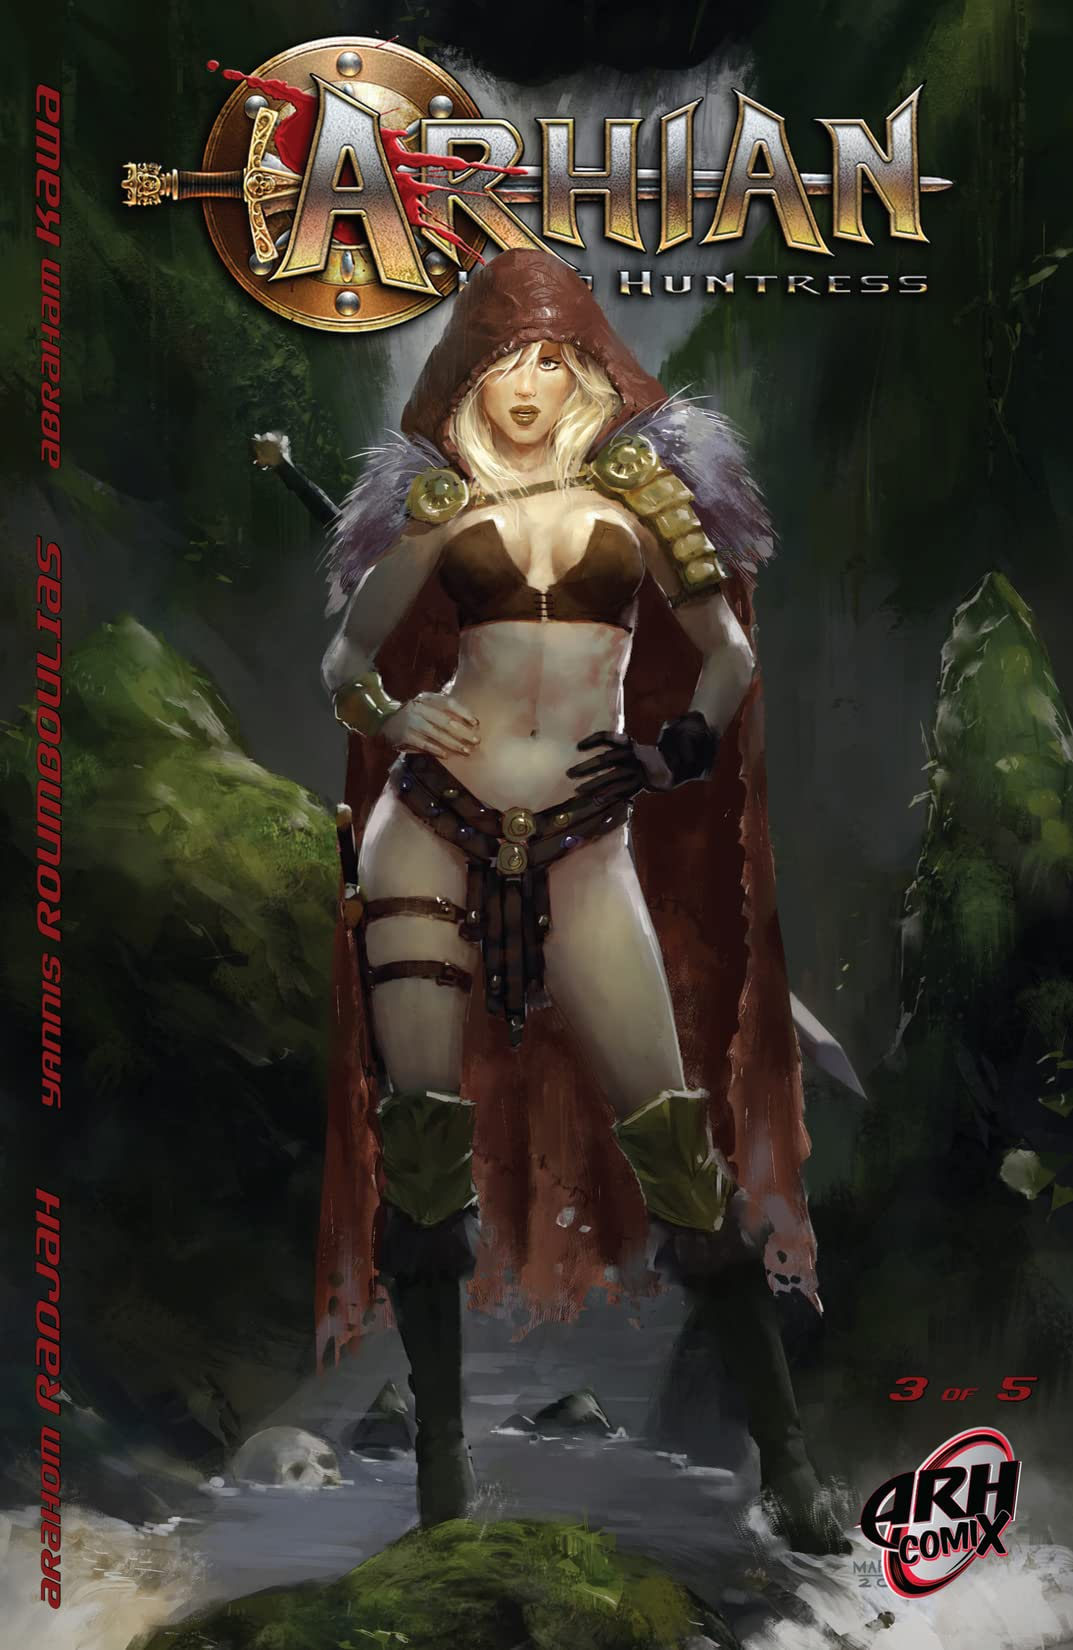 Arhian Head Huntress #3